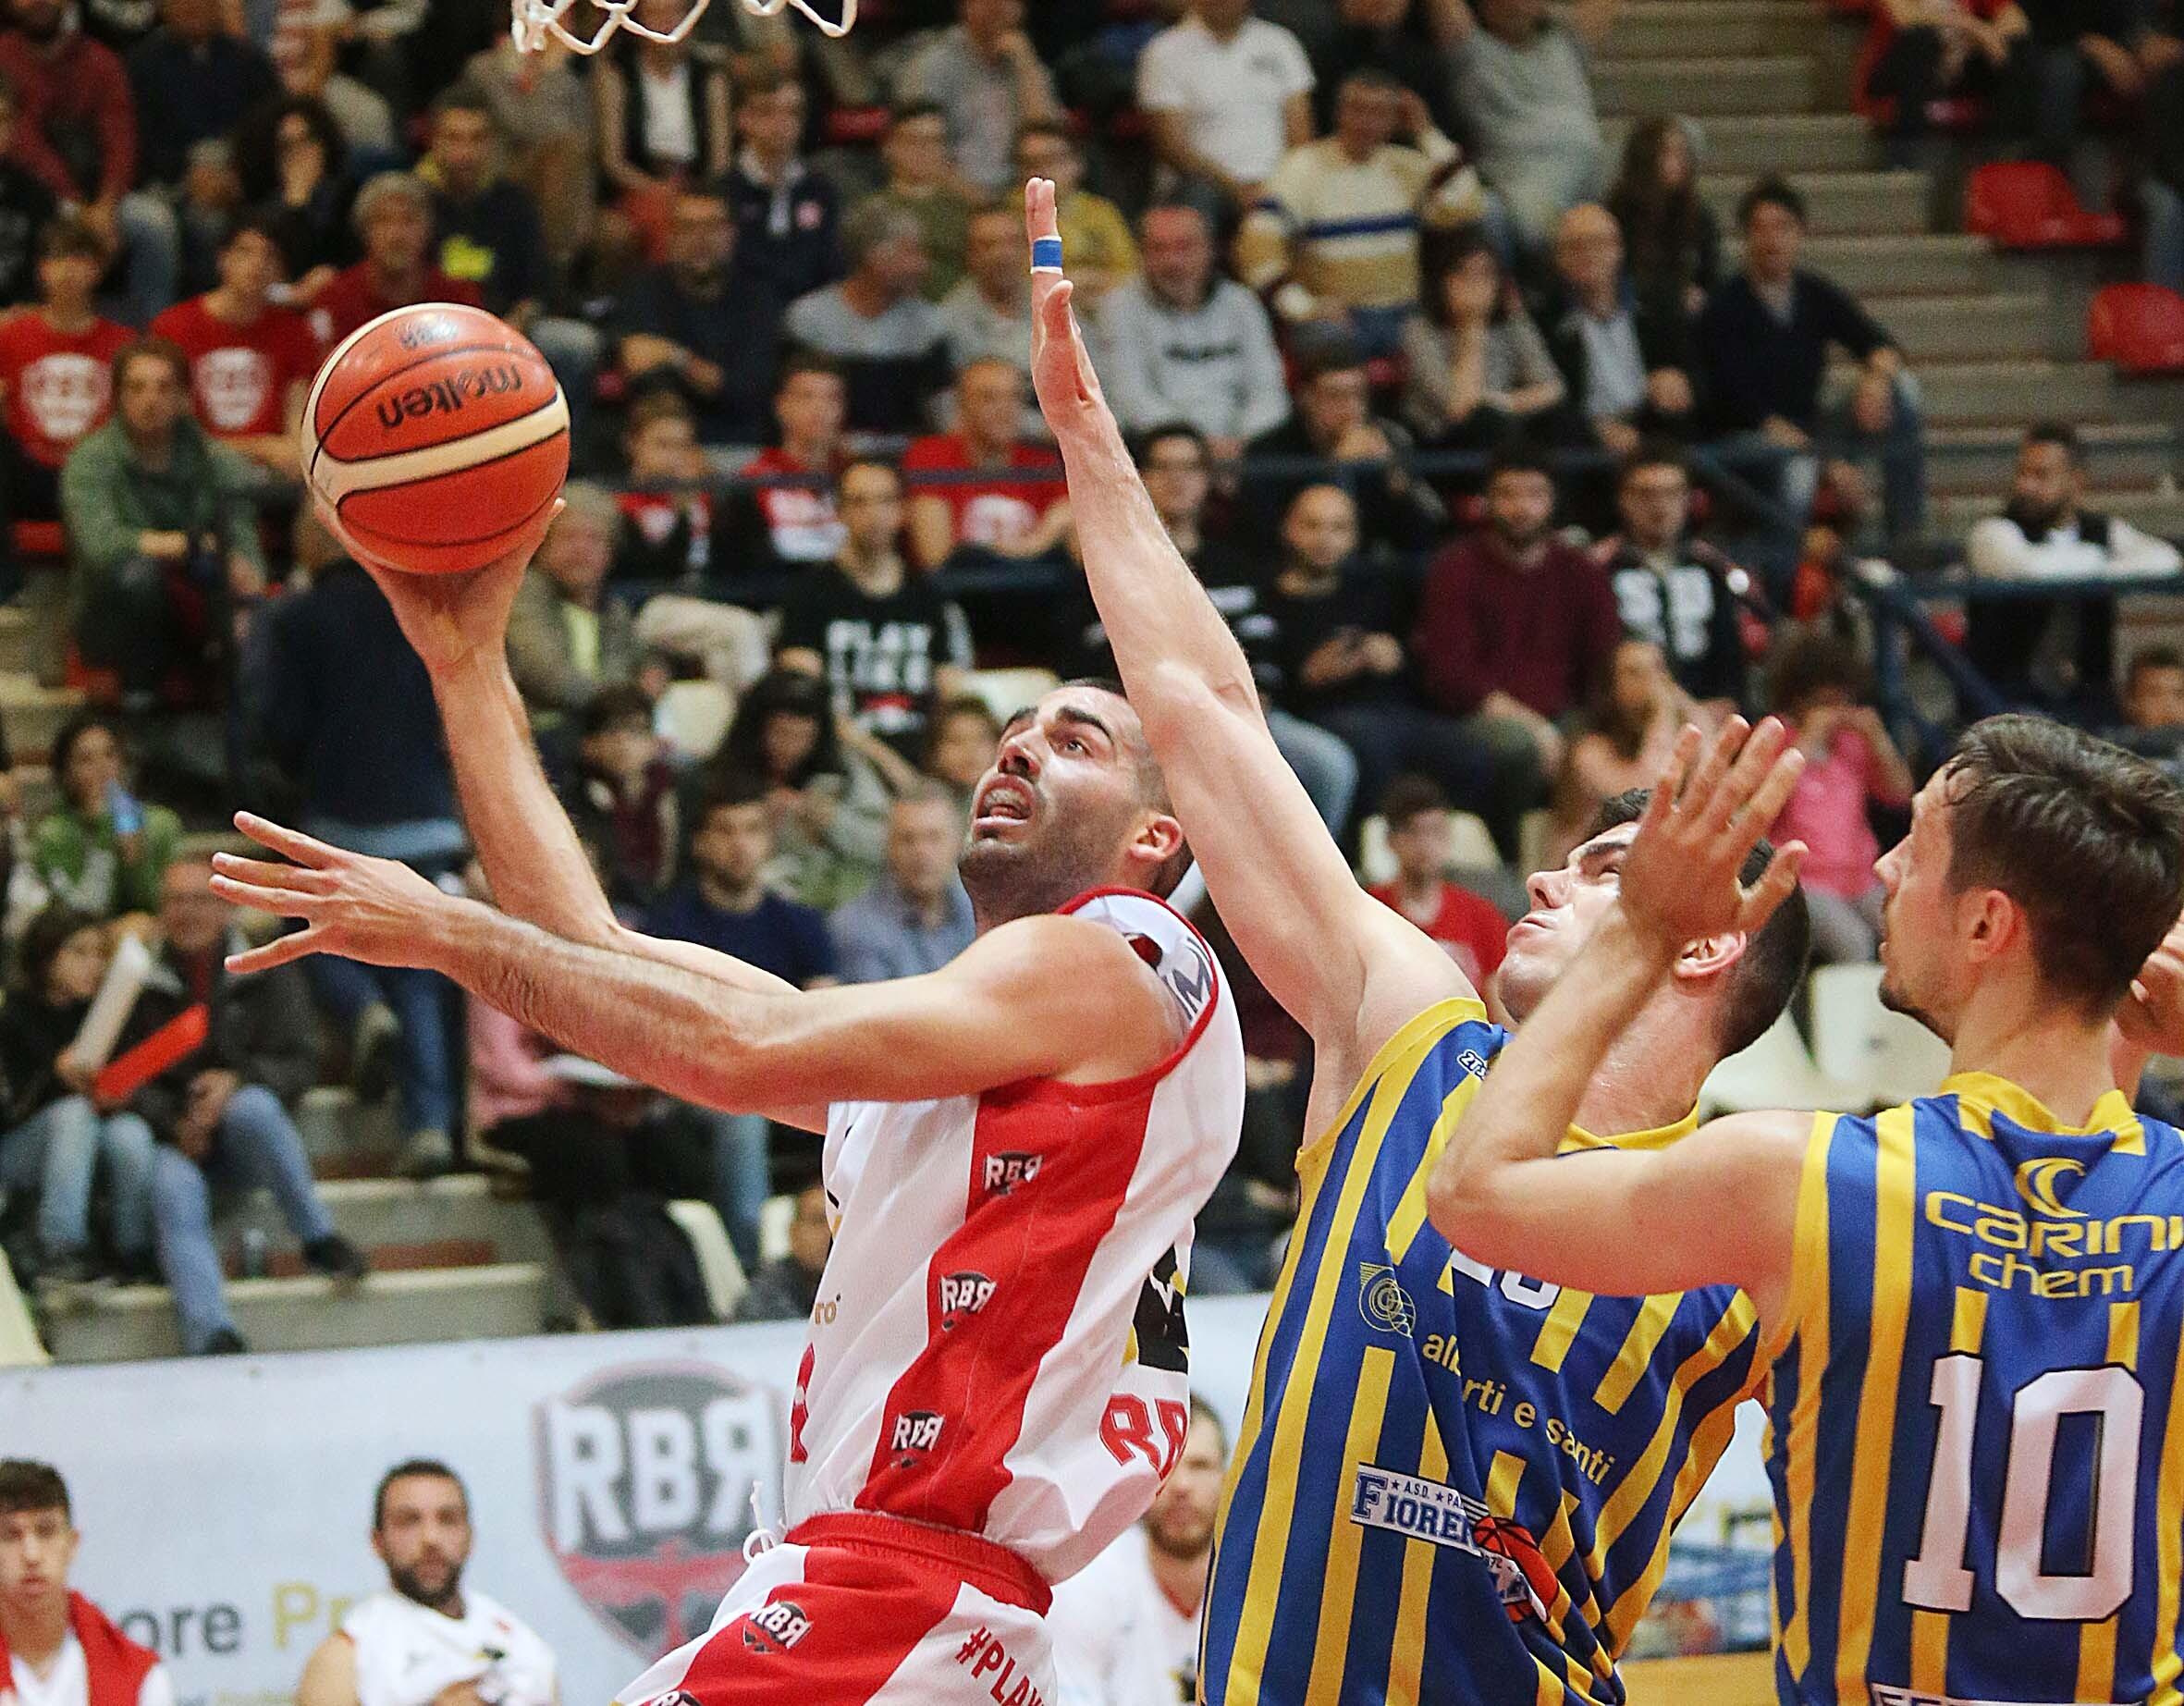 Basket C Gold, rimonte vincenti per Rbr e Virtus